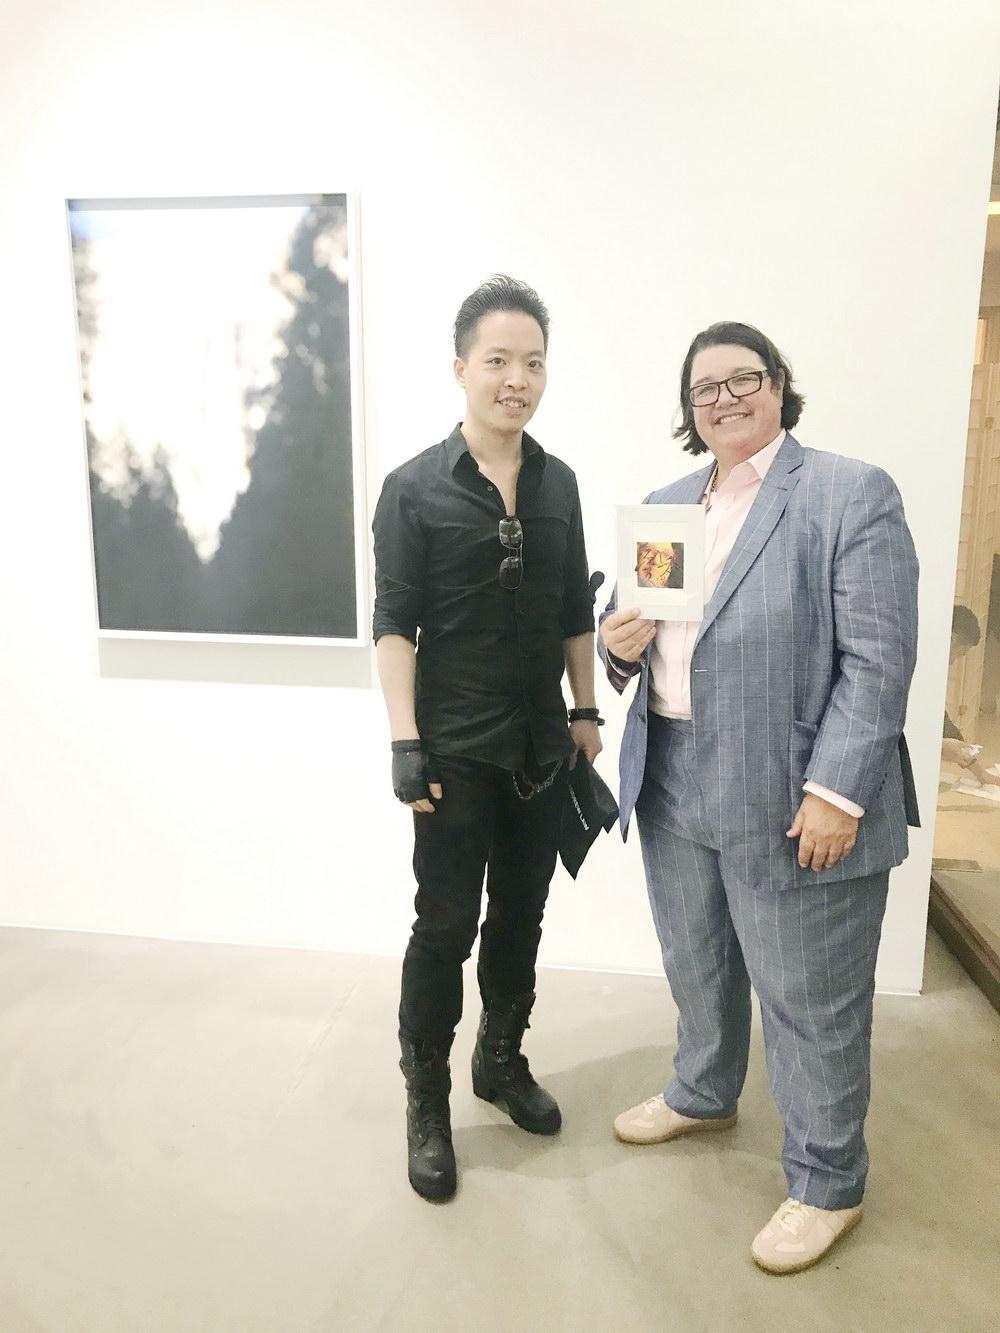 羅卓睿 Michael Andrew Law Cheuk Yui 與著名藝術家 凱瑟琳·奧匹 Catherine Opie